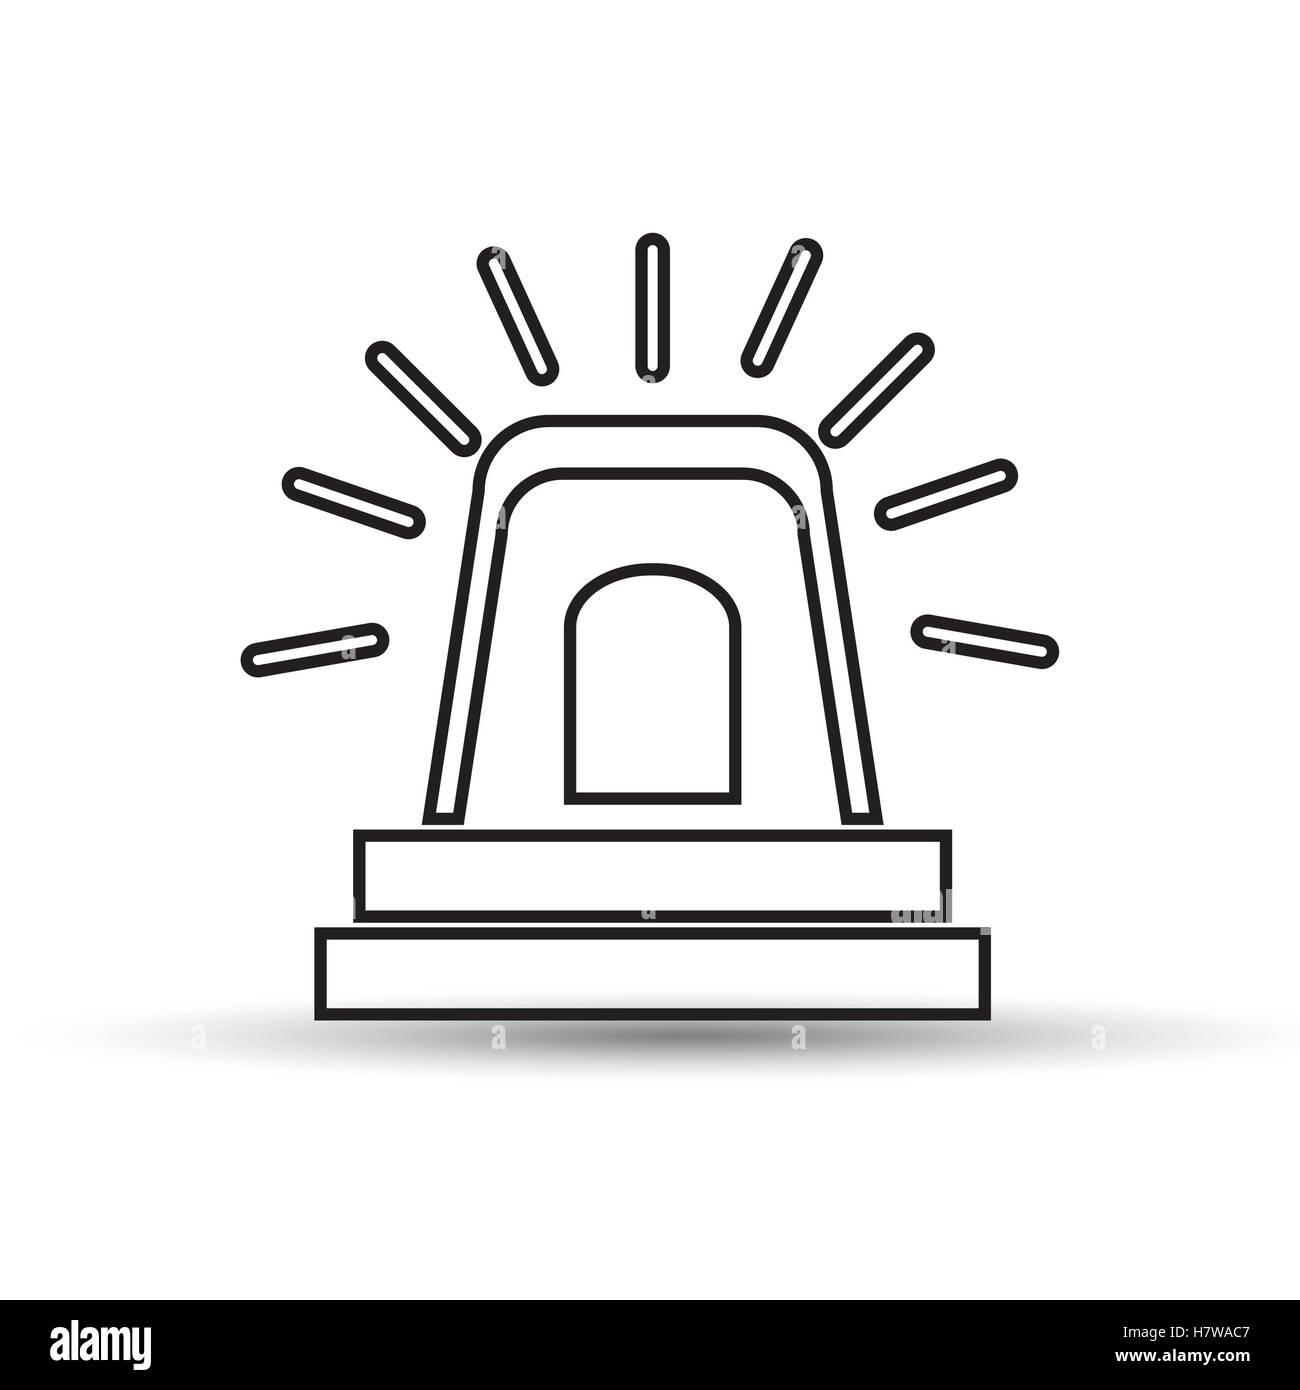 hand drawing alarm alert icon vector illustration eps 10 - Stock Image